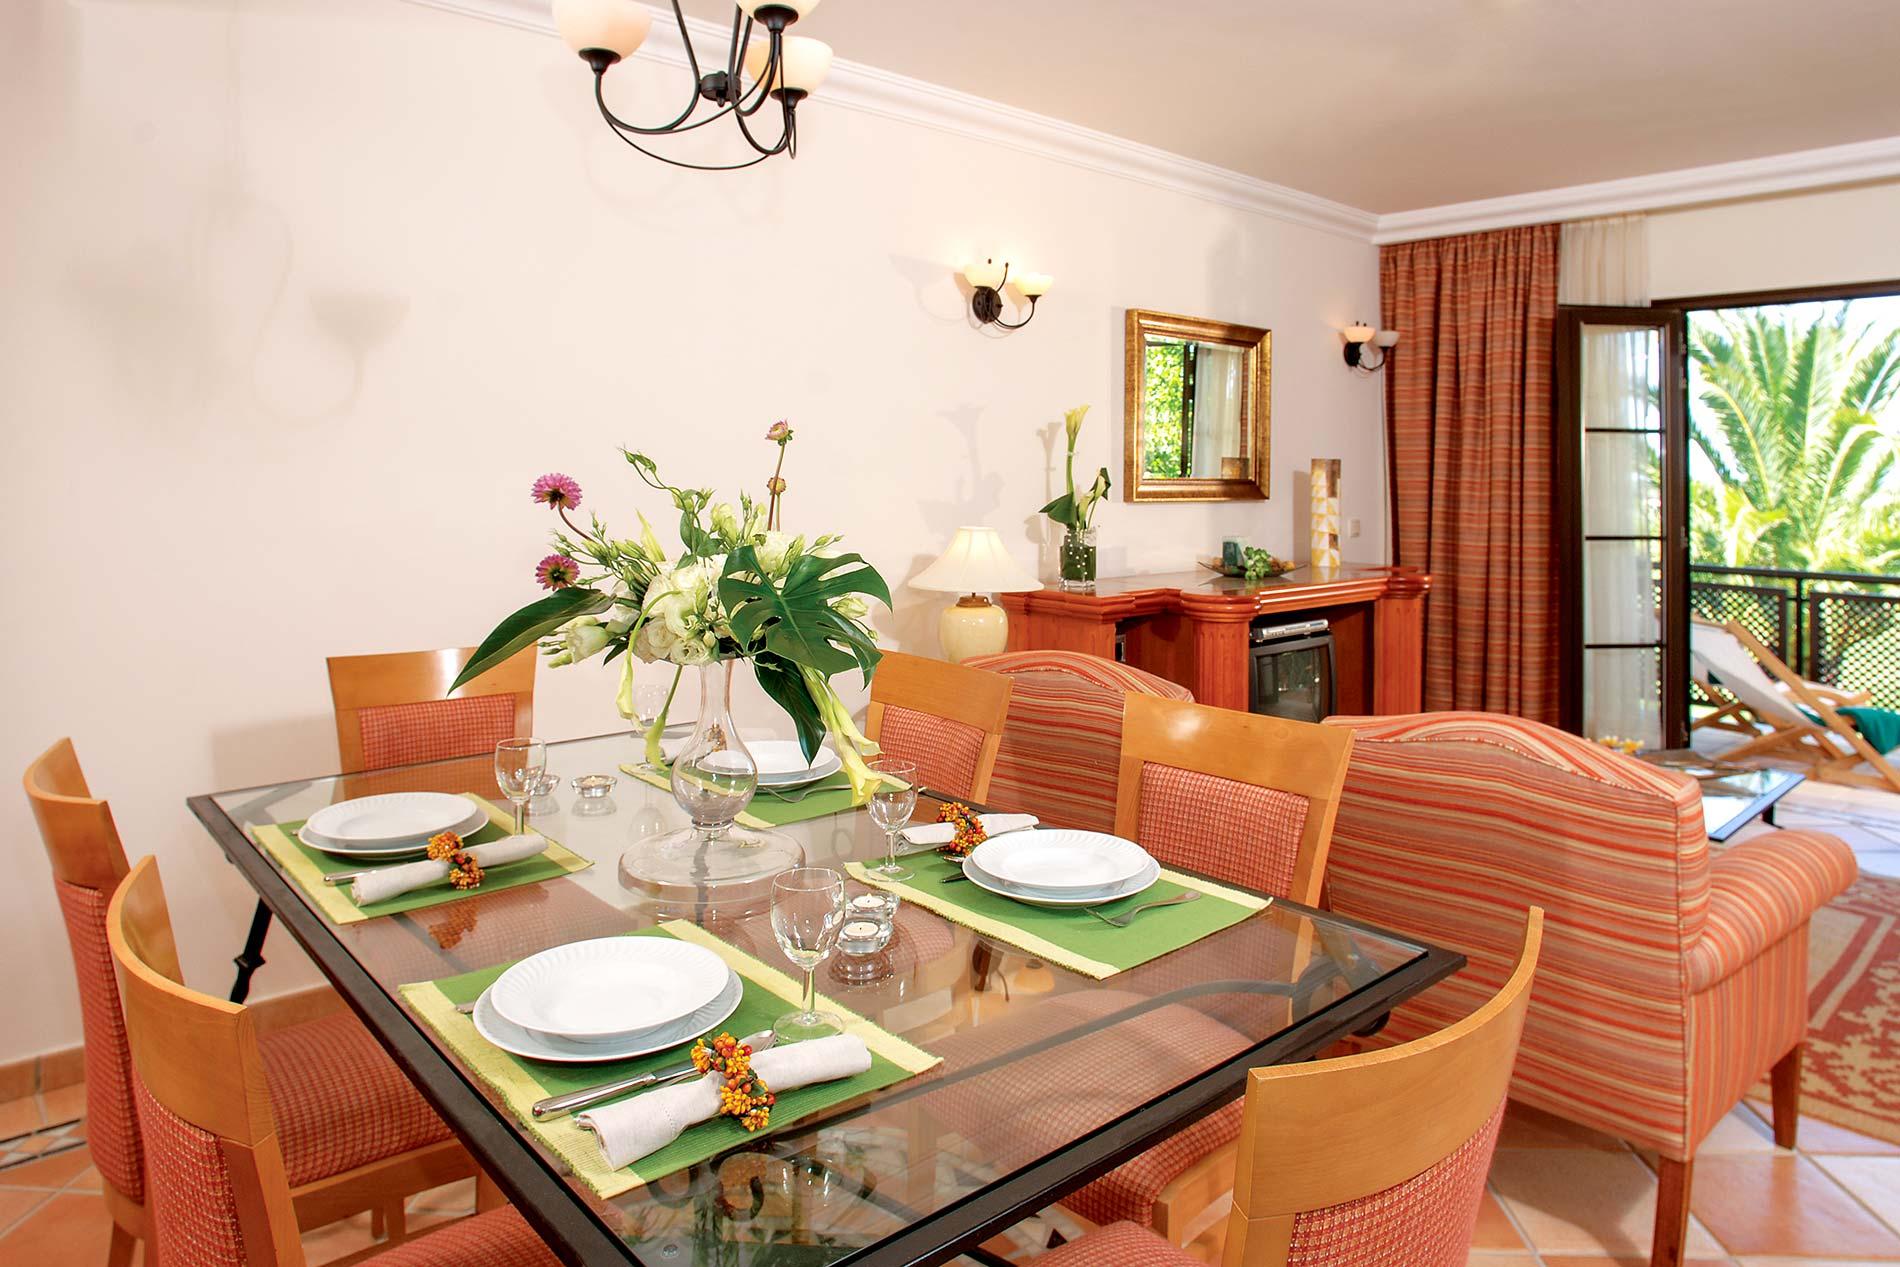 Apartment Pine Cliffs Golf Suite Penthouse in Pine Cliffs Resort - sleeps 6 people